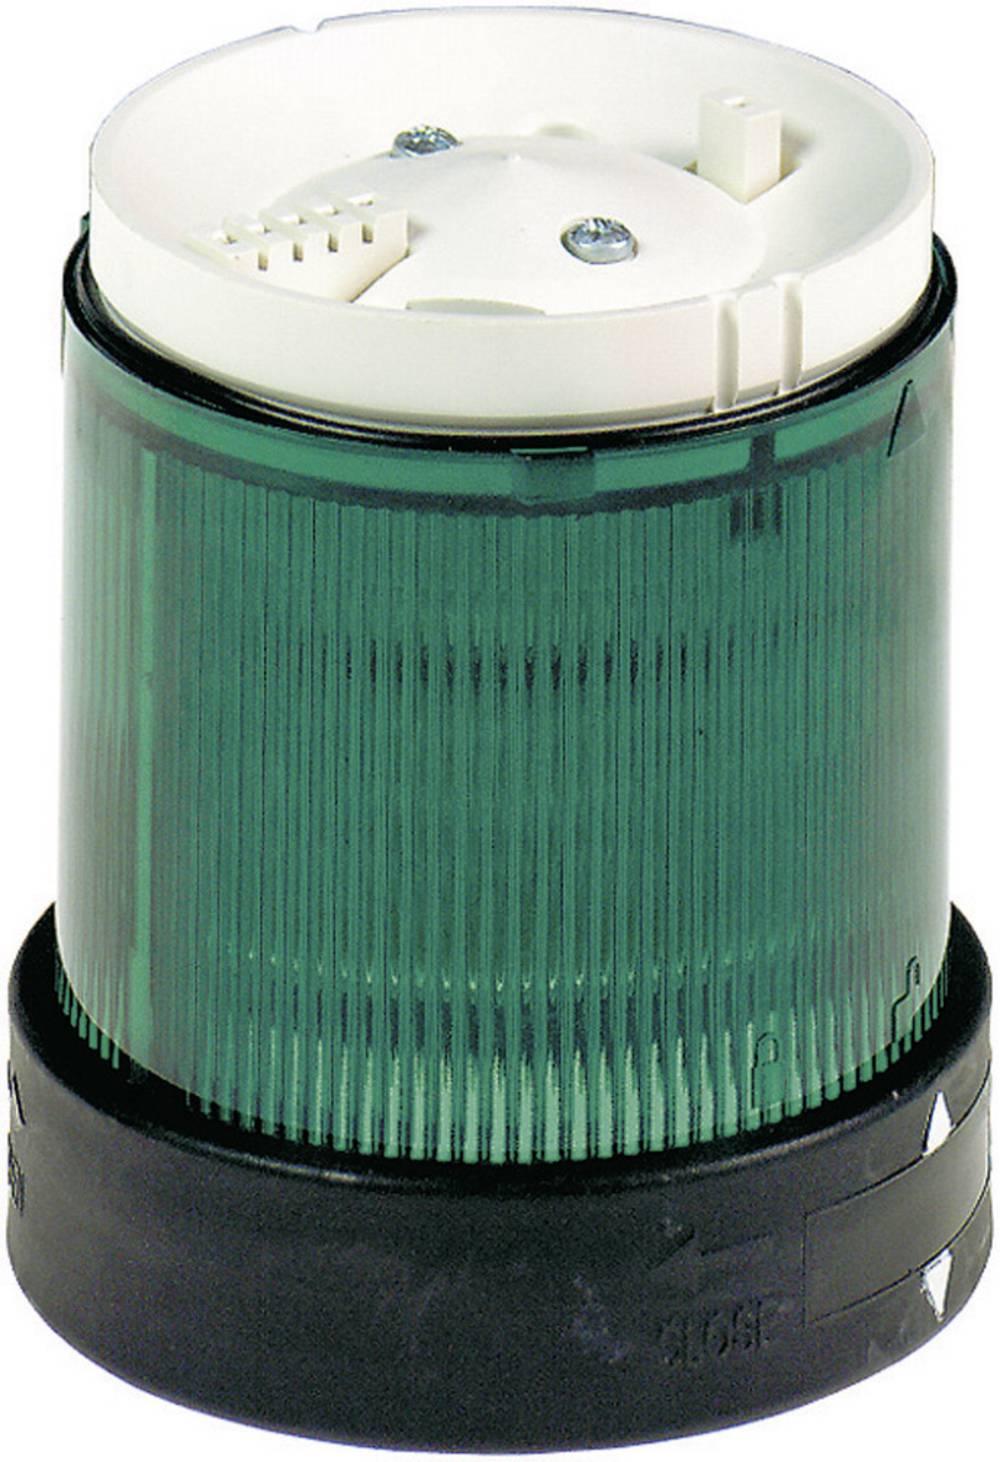 Svjetilni element za signalnestubove Schneider Electric 00602 0060262